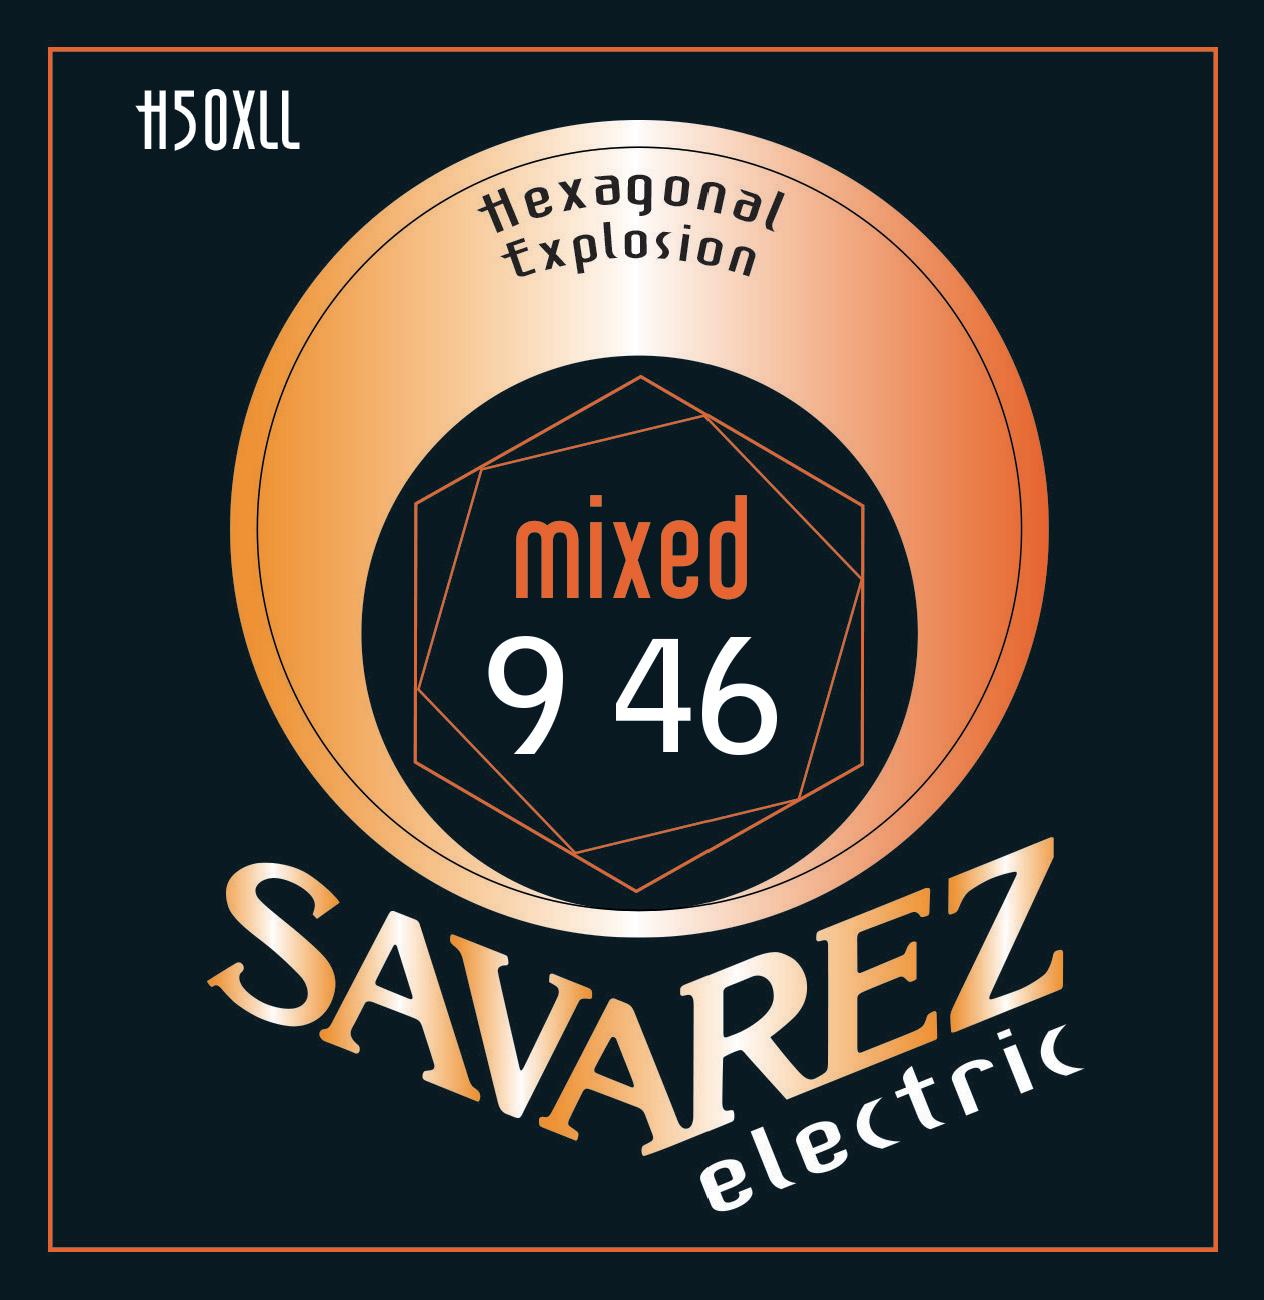 SAVAREZ ELECTRIC HEXAGONAL EXPLOSION H50XLL